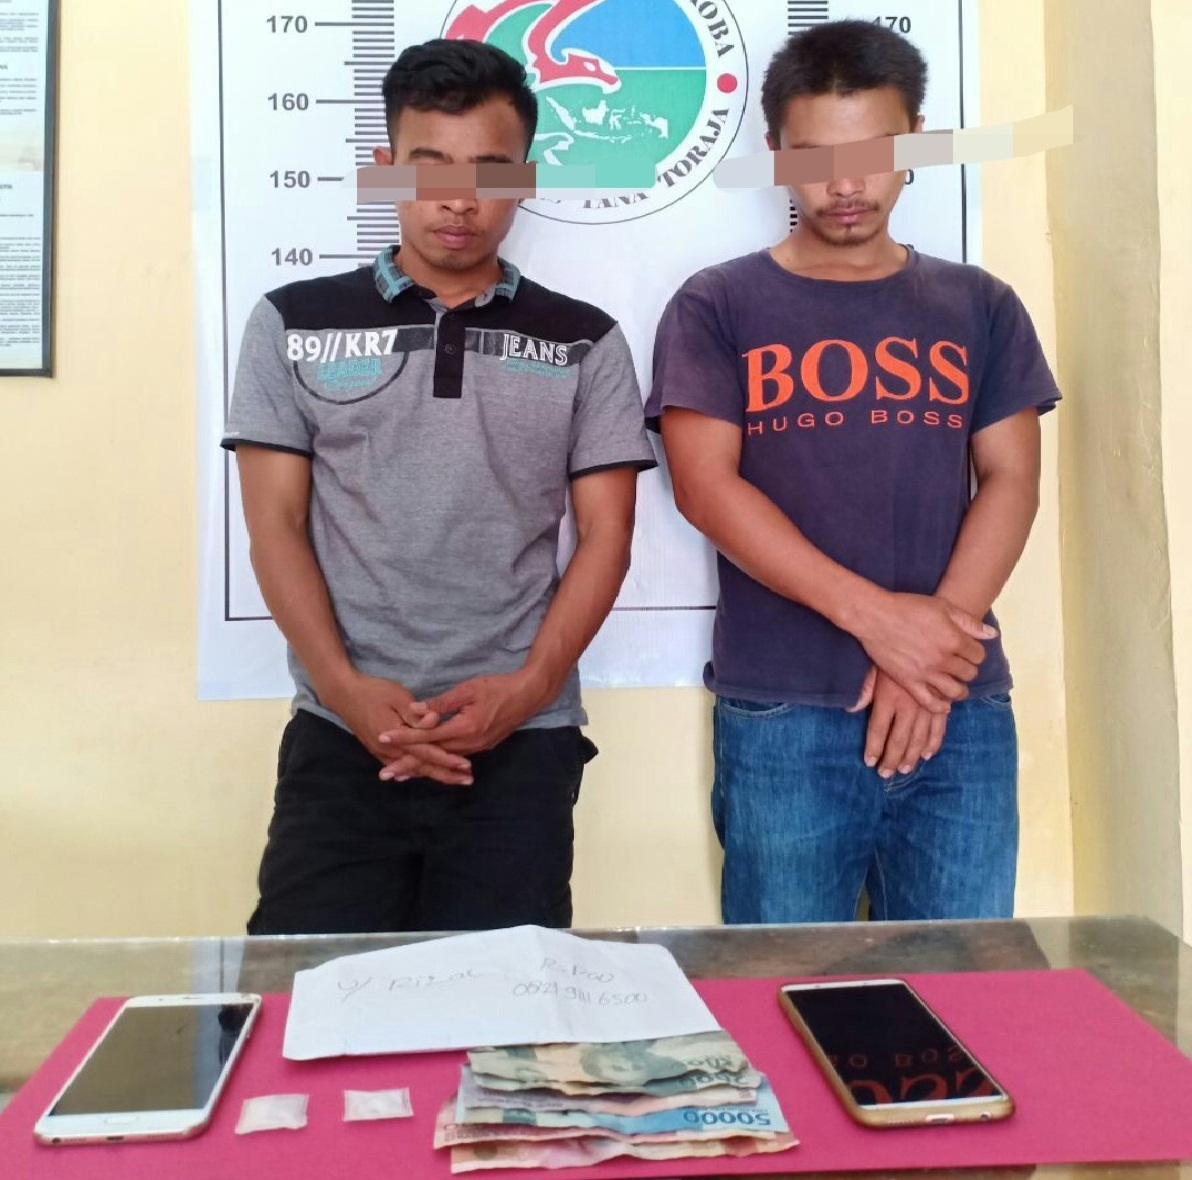 Polisi Temukan Narkotika yang Dikirim Lewat Bus Makassar-Toraja, Dua Pelaku Diciduk